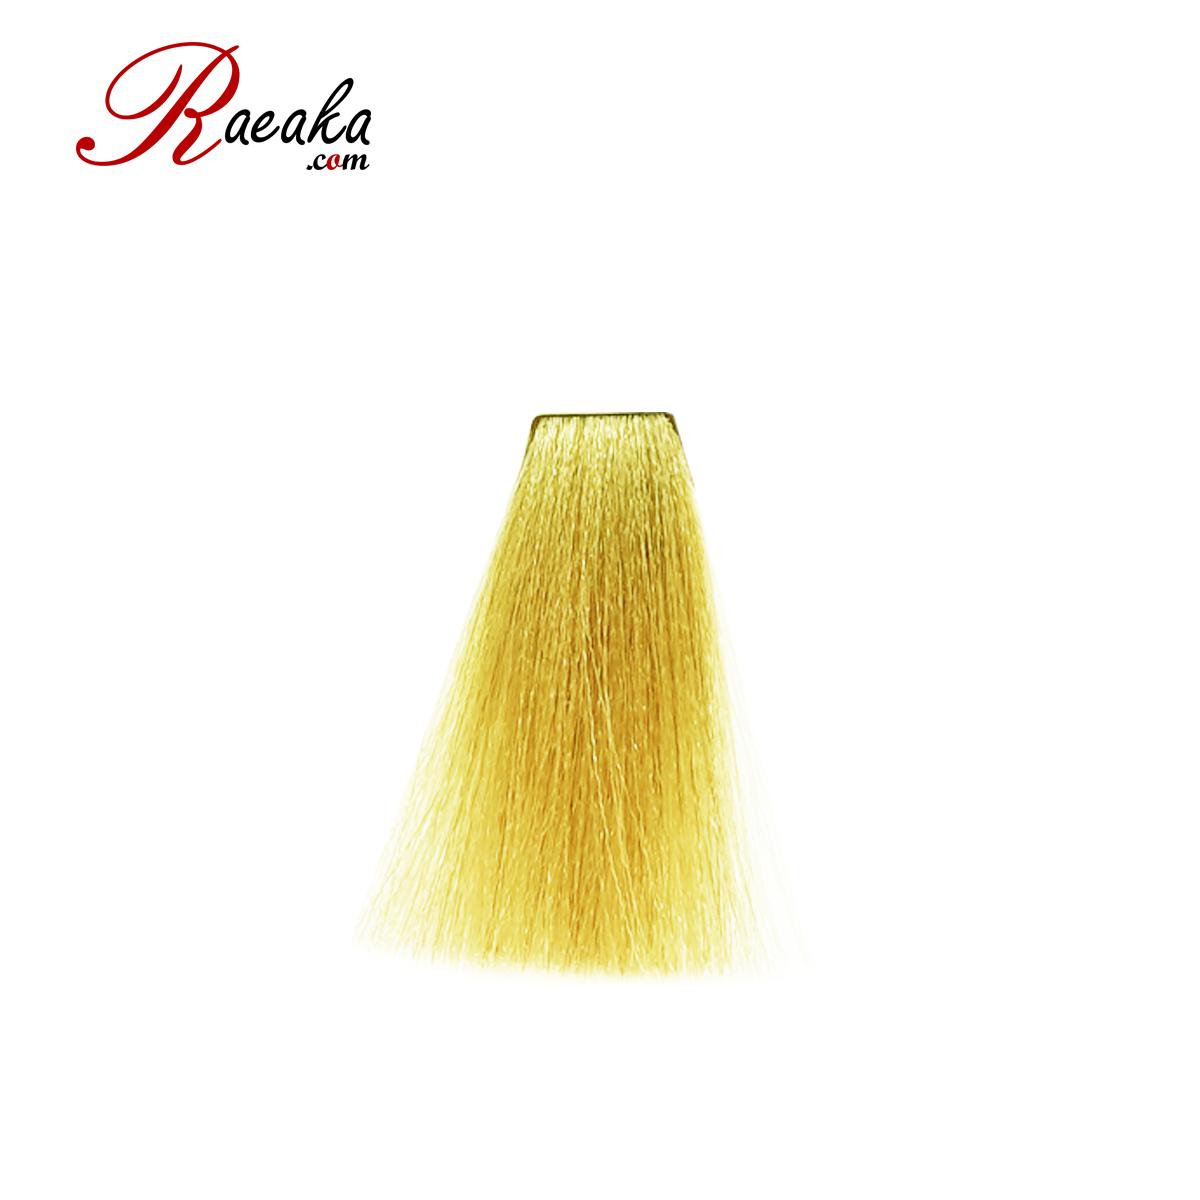 رنگ مو دوماسی سری طلایی بلوند طلایی خیلی روشن ۹٫۳ حجم ۱۲۰ میلی لیتر